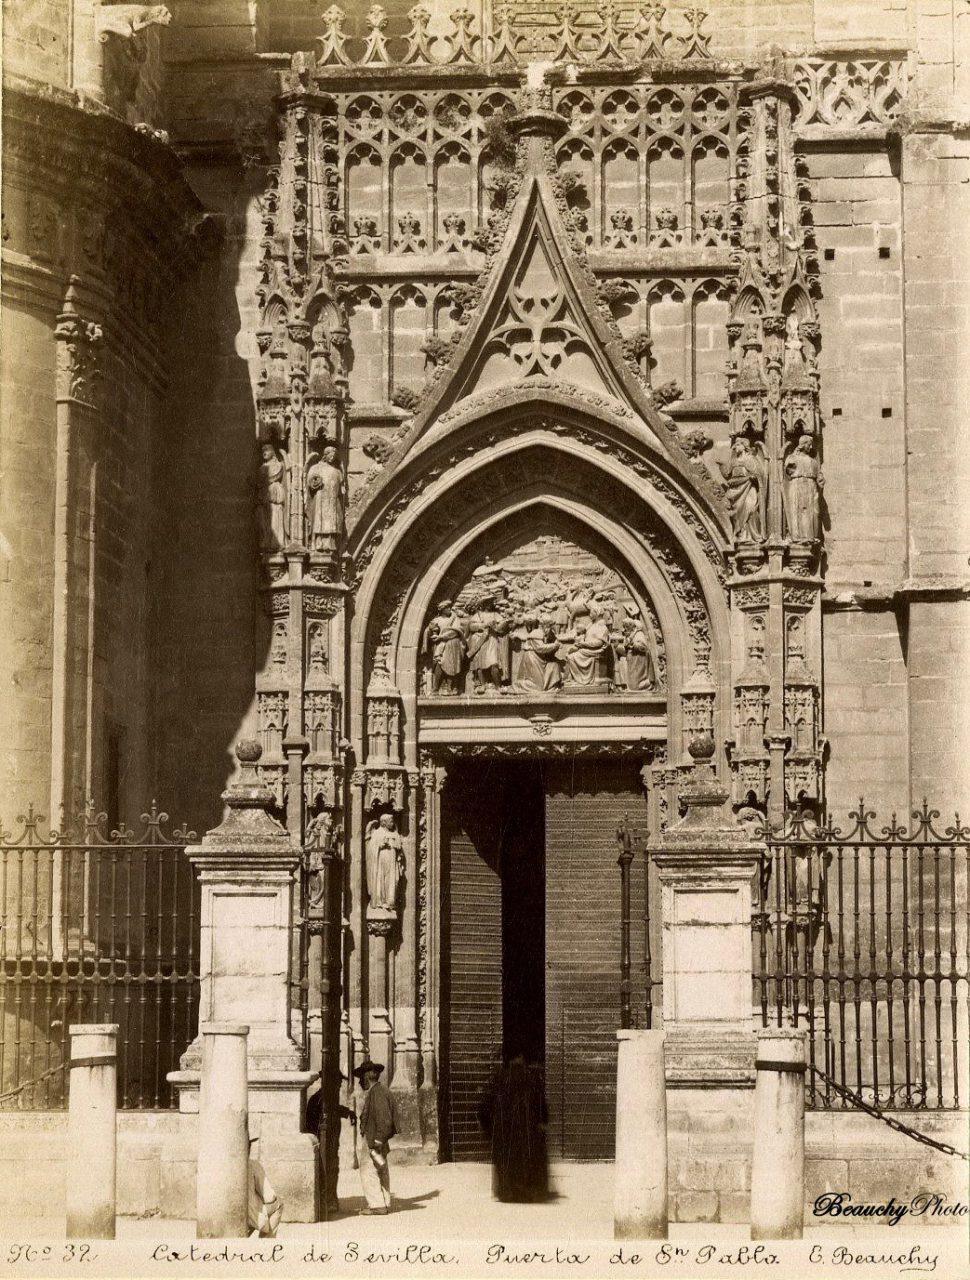 Beauchyphoto_Puerta_de_San_Pablo_Catedral_Sevilla_c1880_Emilio_Beauchy_Cano_fotografias_antiguas_postales_vistas_y_monumentos